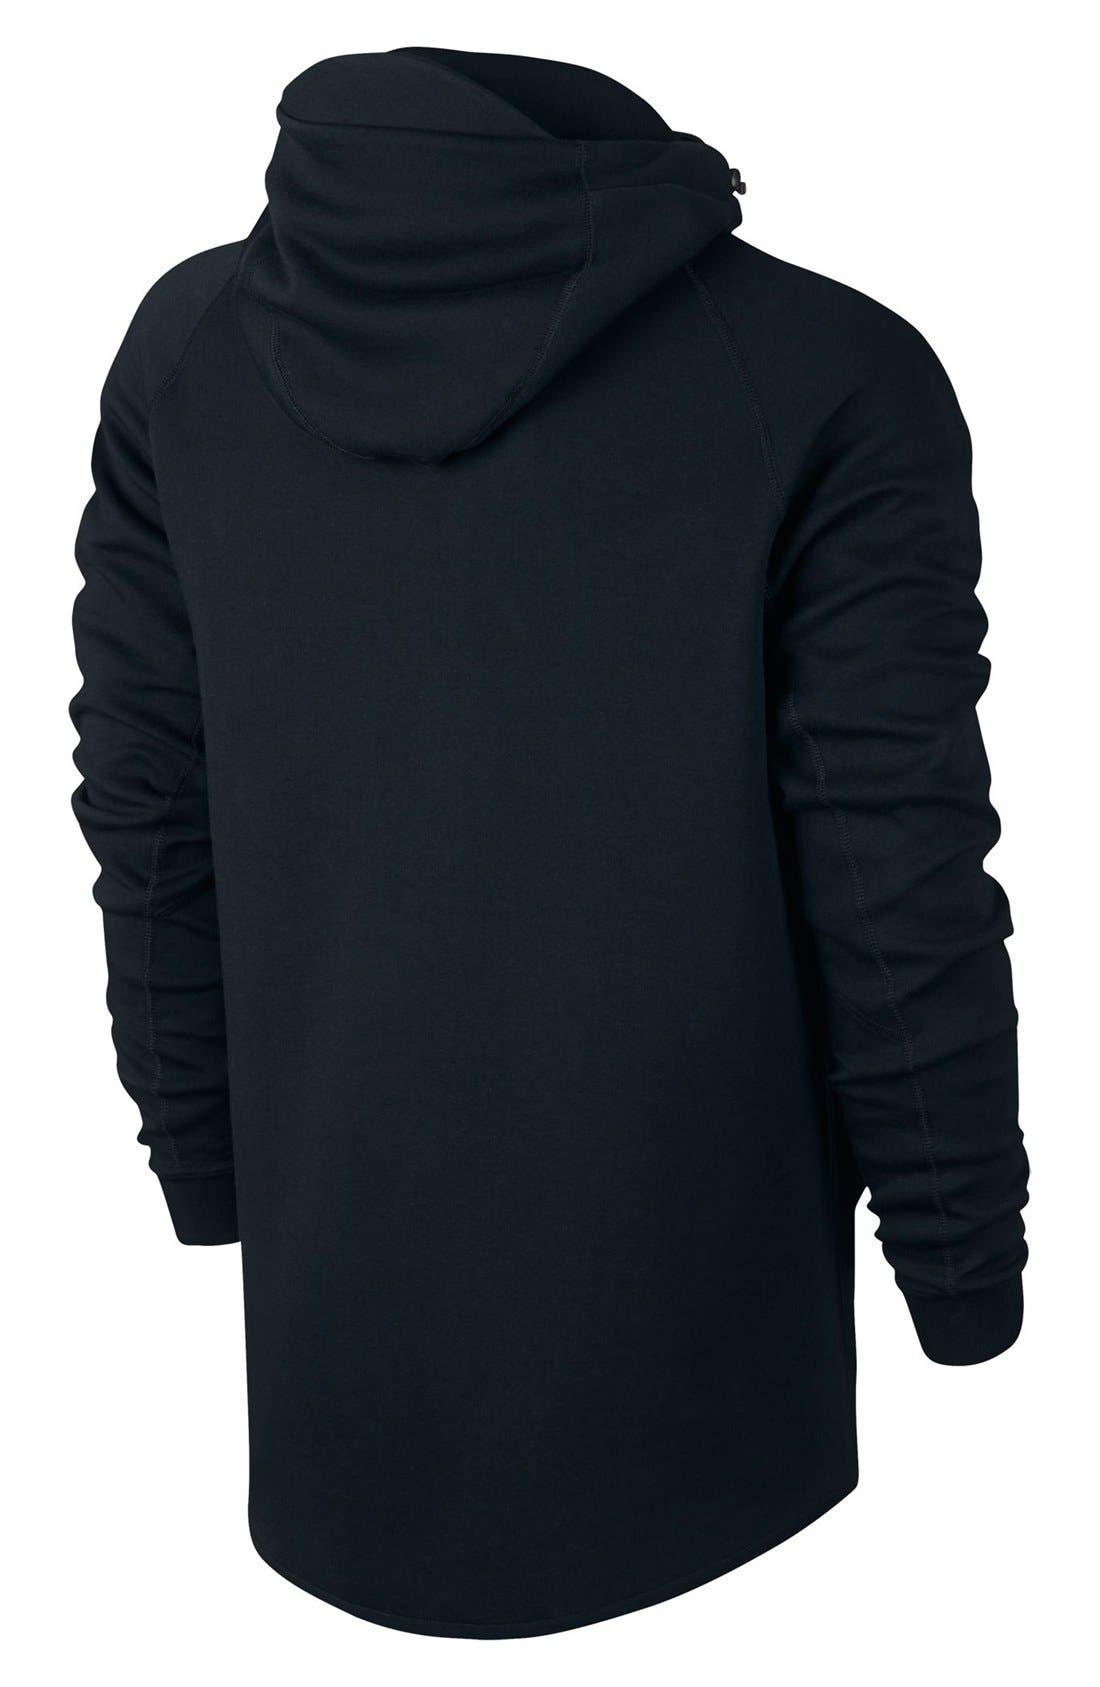 'Tech Fleece Hero' Full Zip Hoodie,                             Alternate thumbnail 6, color,                             010